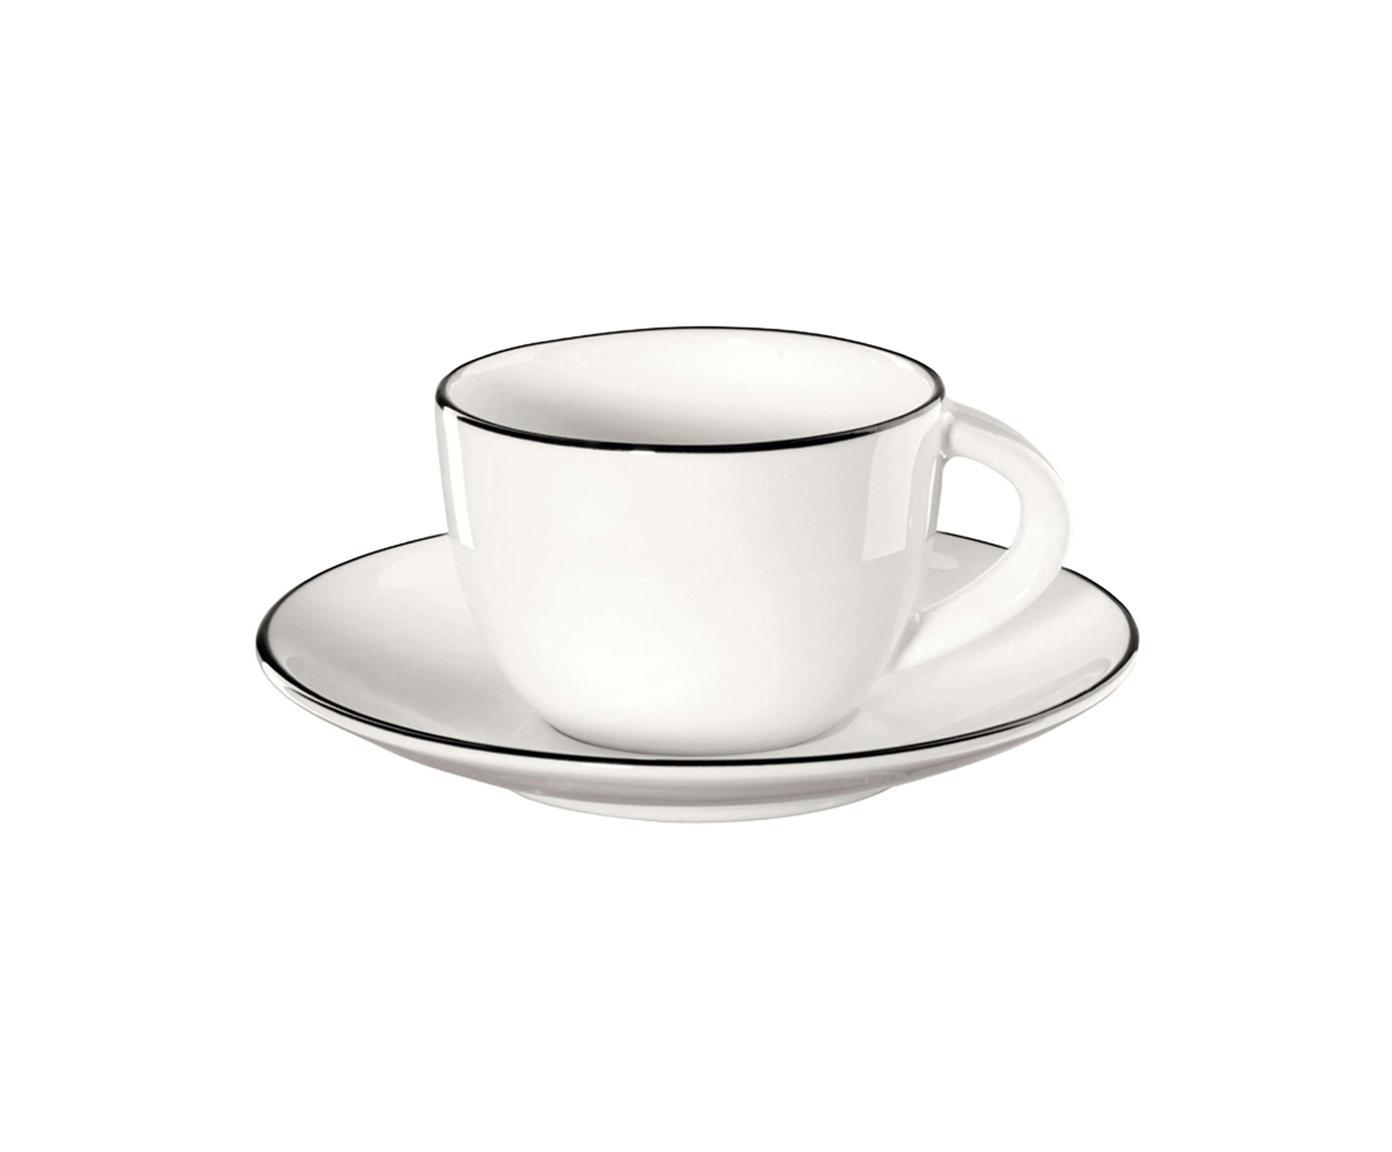 Set tazzine da caffè da tavola ligne noir, 8 pz., Porcellana Fine Bone China, Bianco Bordo: nero, Ø 6 x A 5 cm